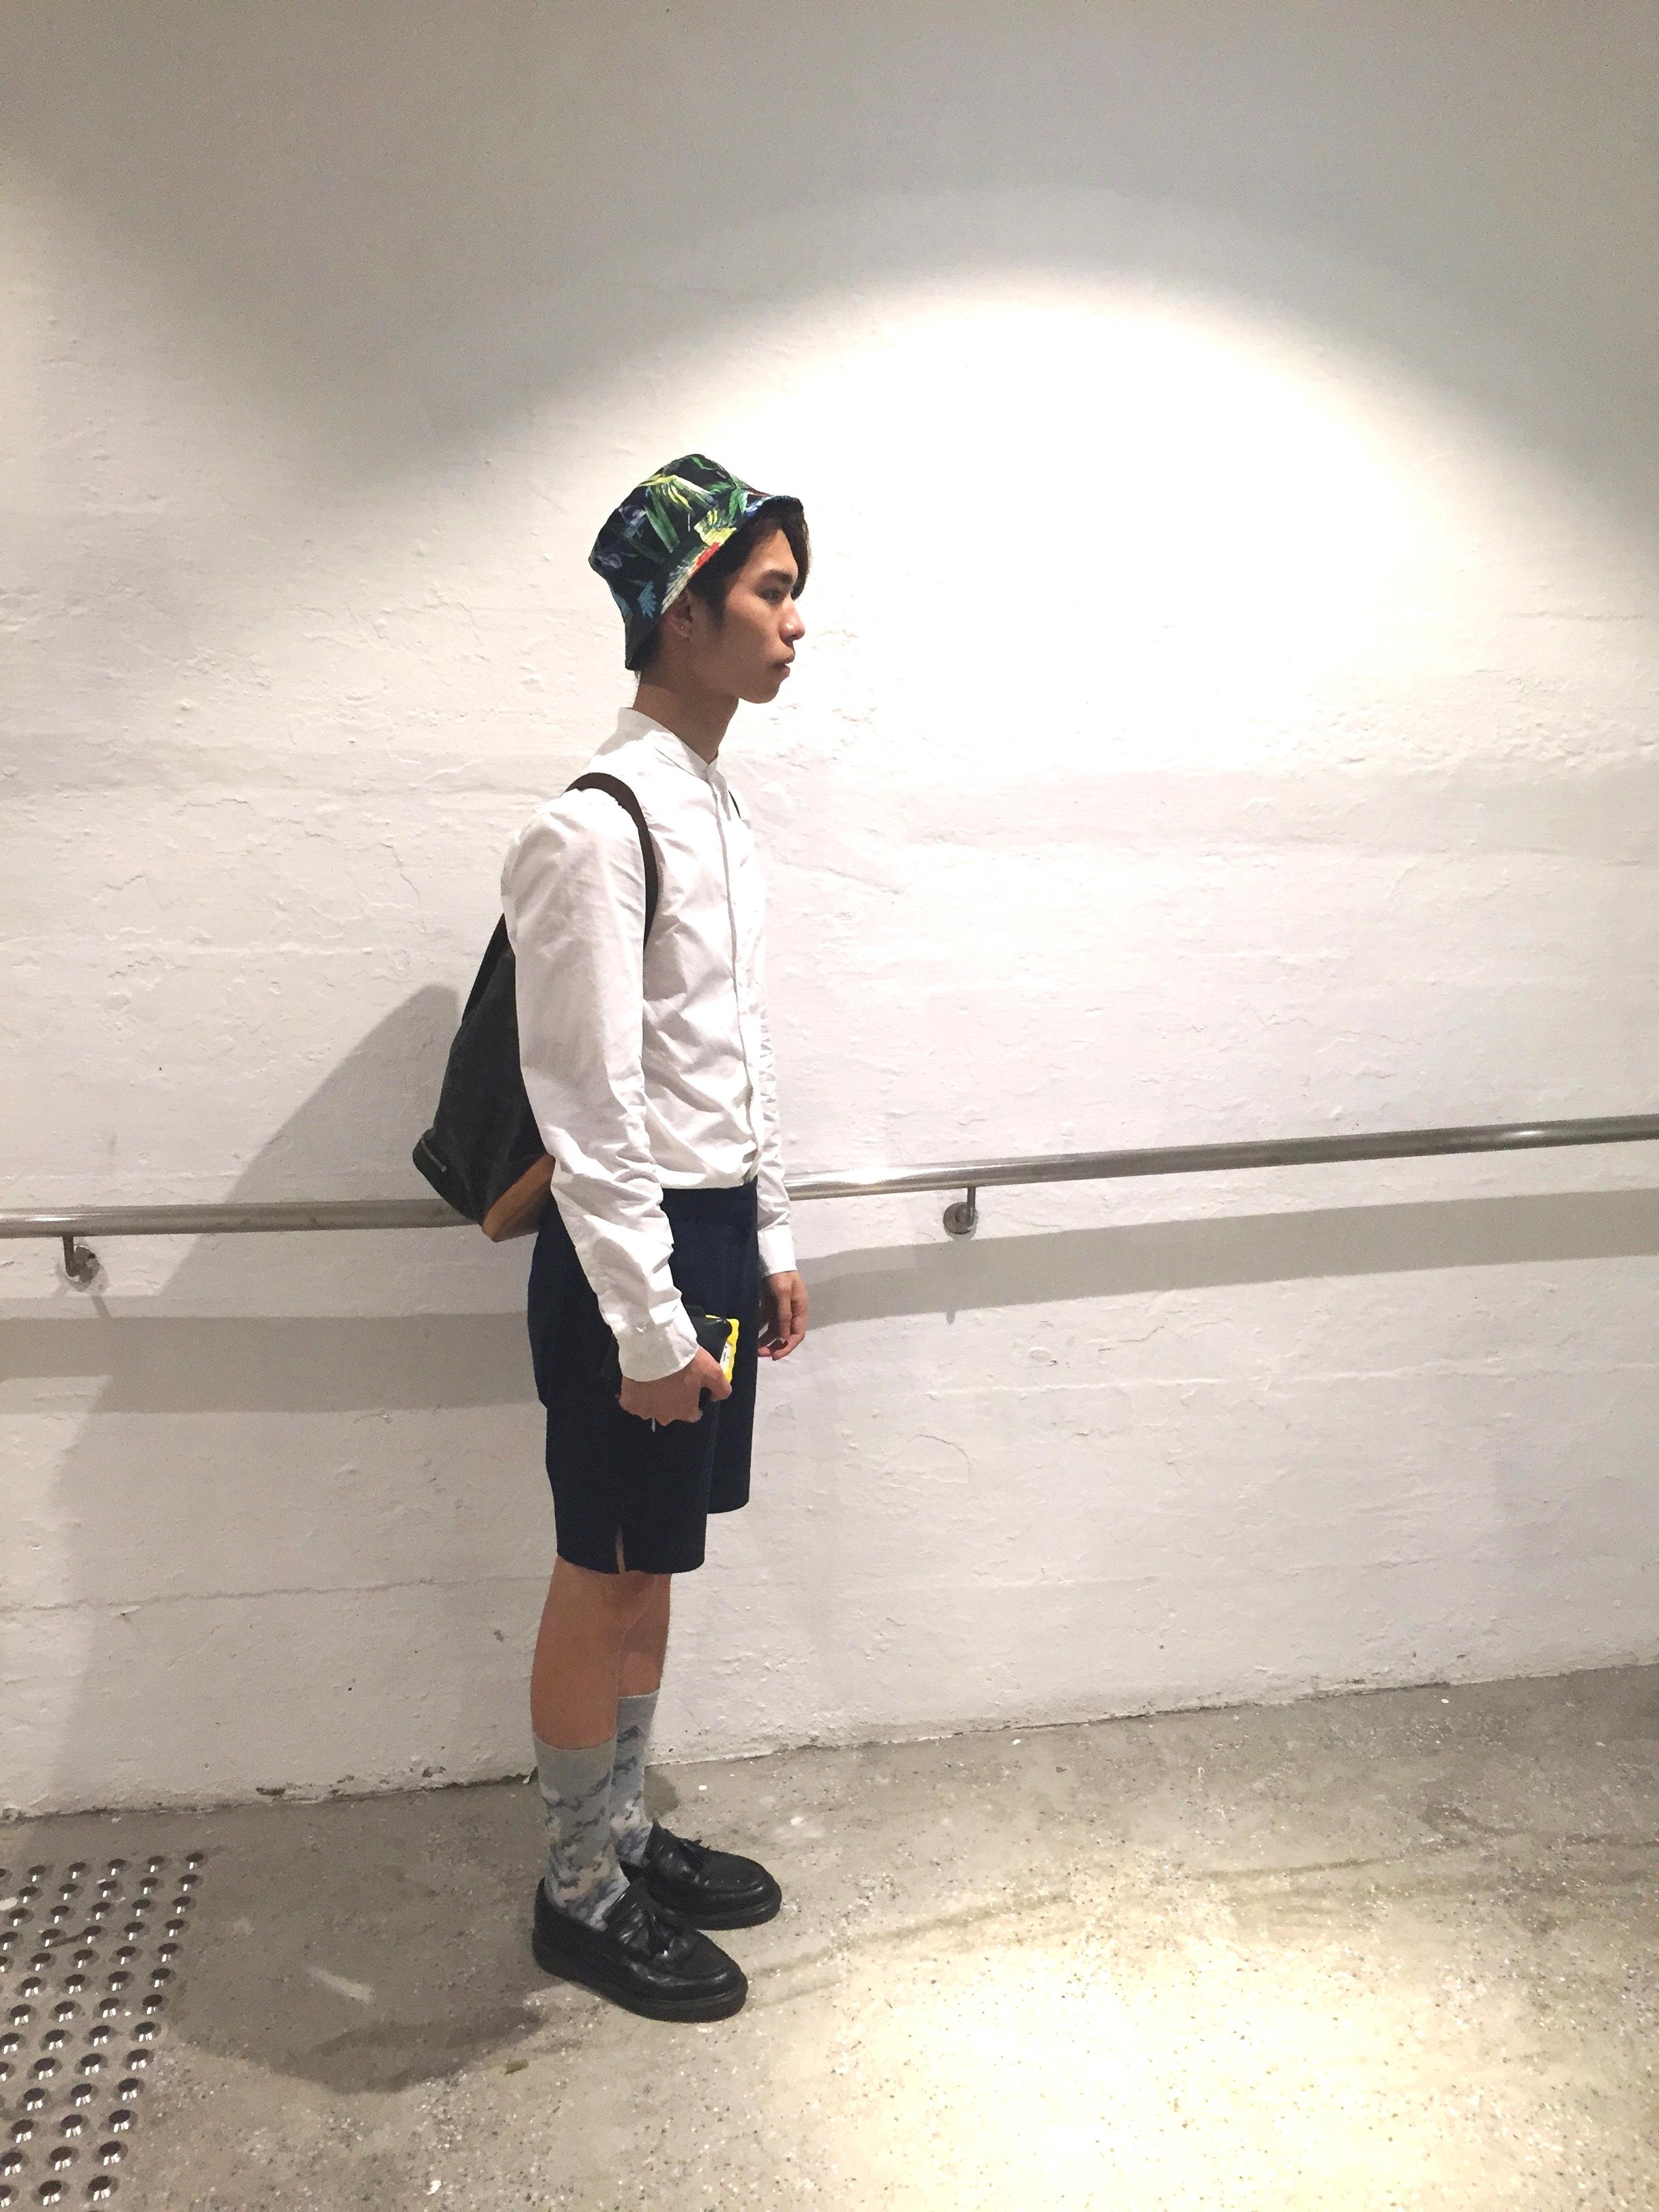 Mite wears :  Shirt - H&M  Shorts - Grandma Vintage  Socks - GV  Shoes - Dr. Martens  Hat - H&M  Bag - Louis Vuitton